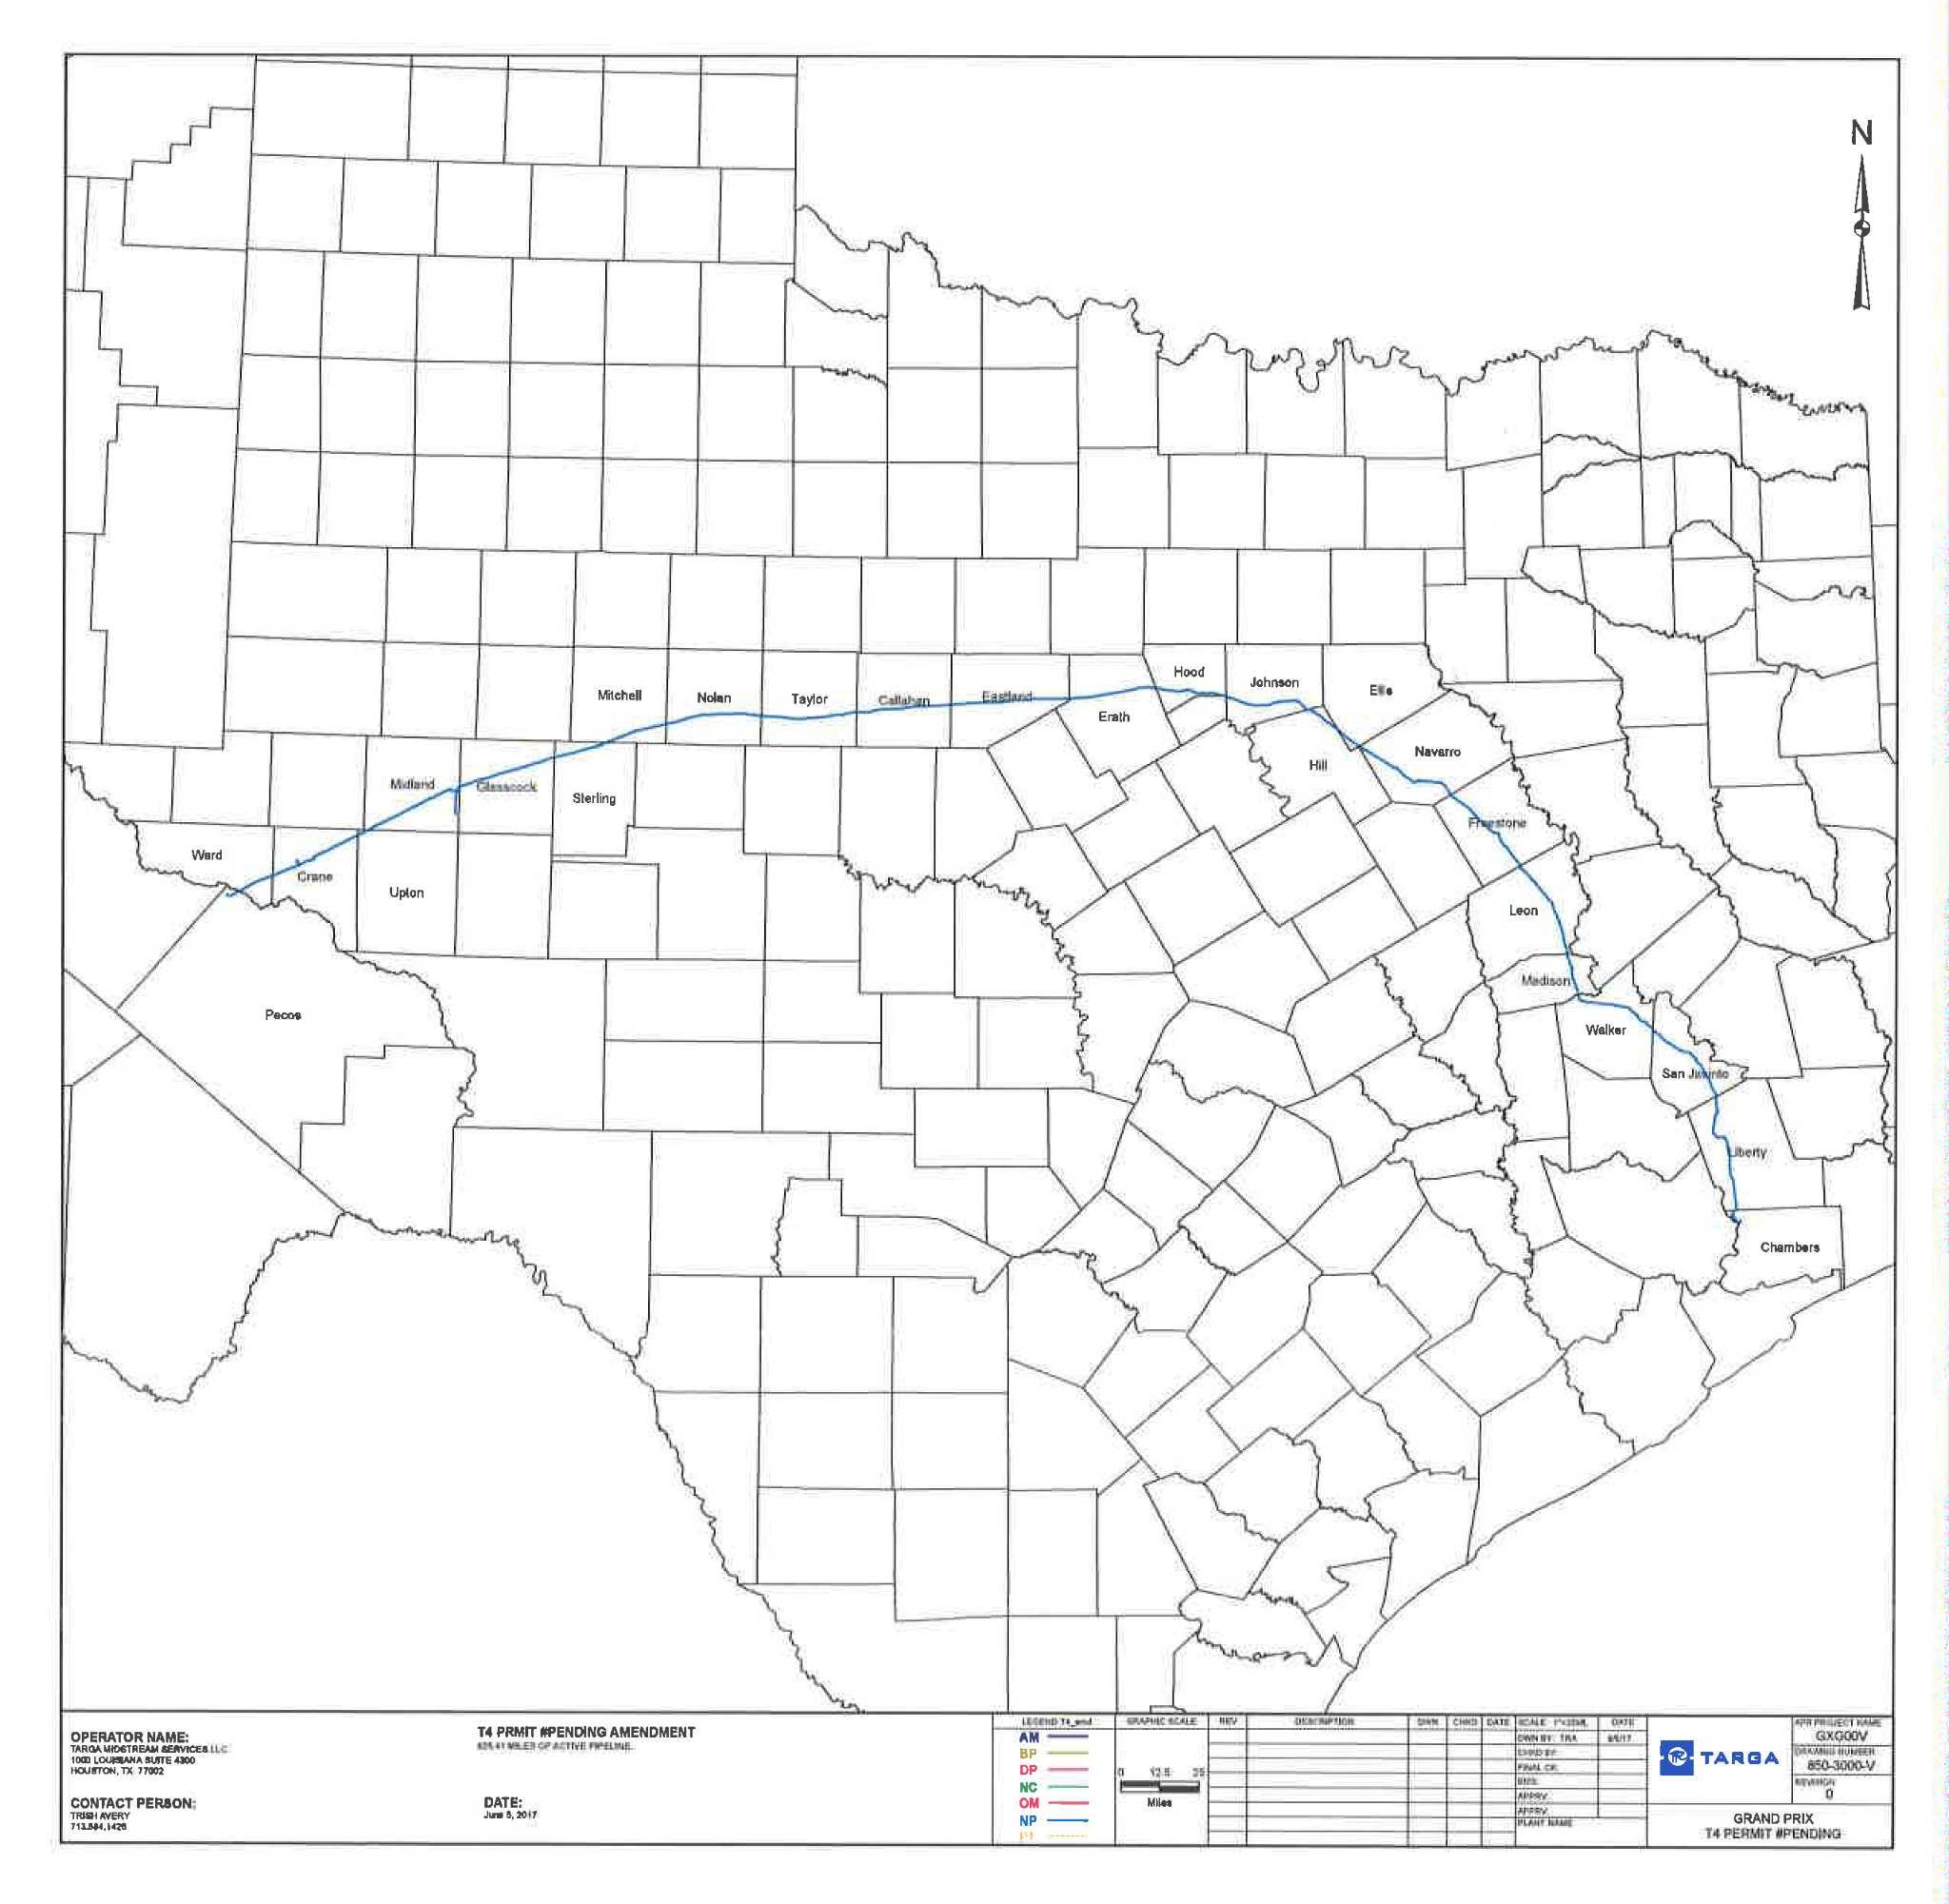 Targa to build NGL pipeline through Liberty County